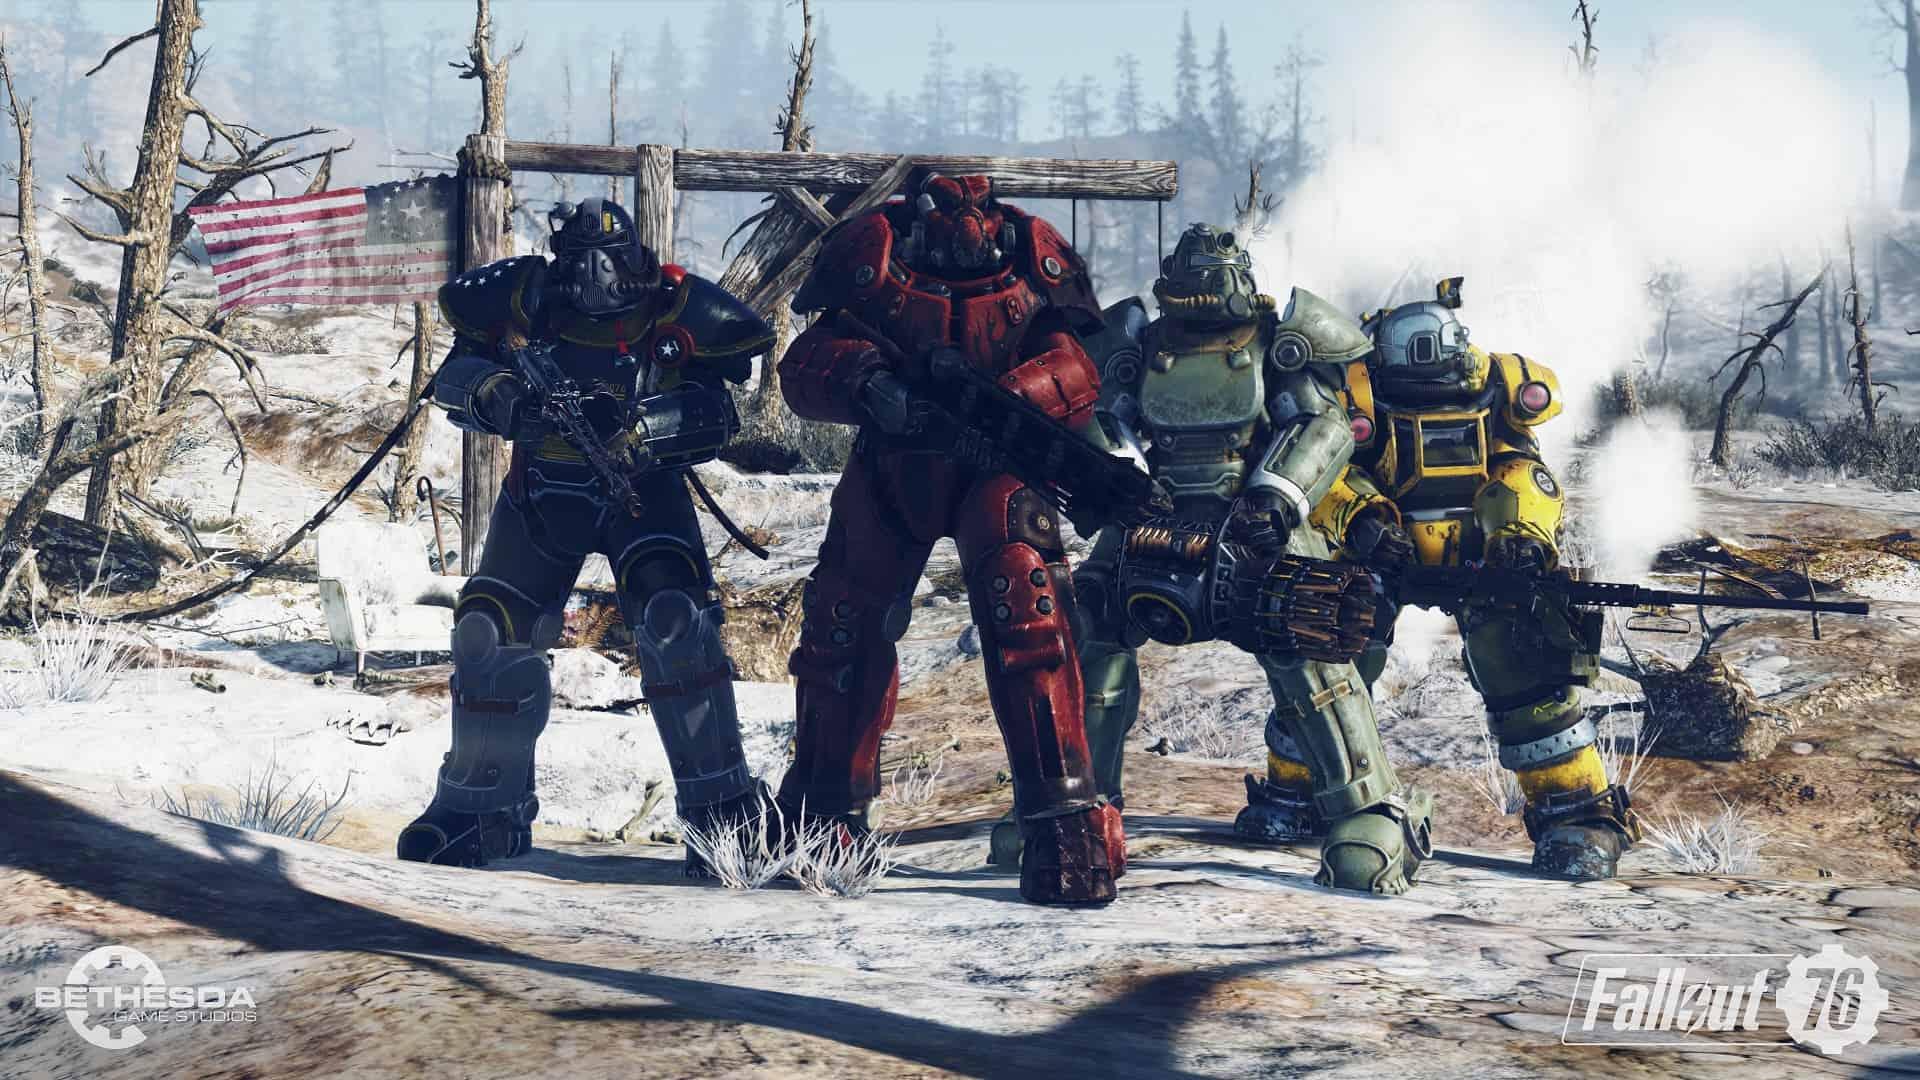 Fallout 76 im Test - PowerArmors